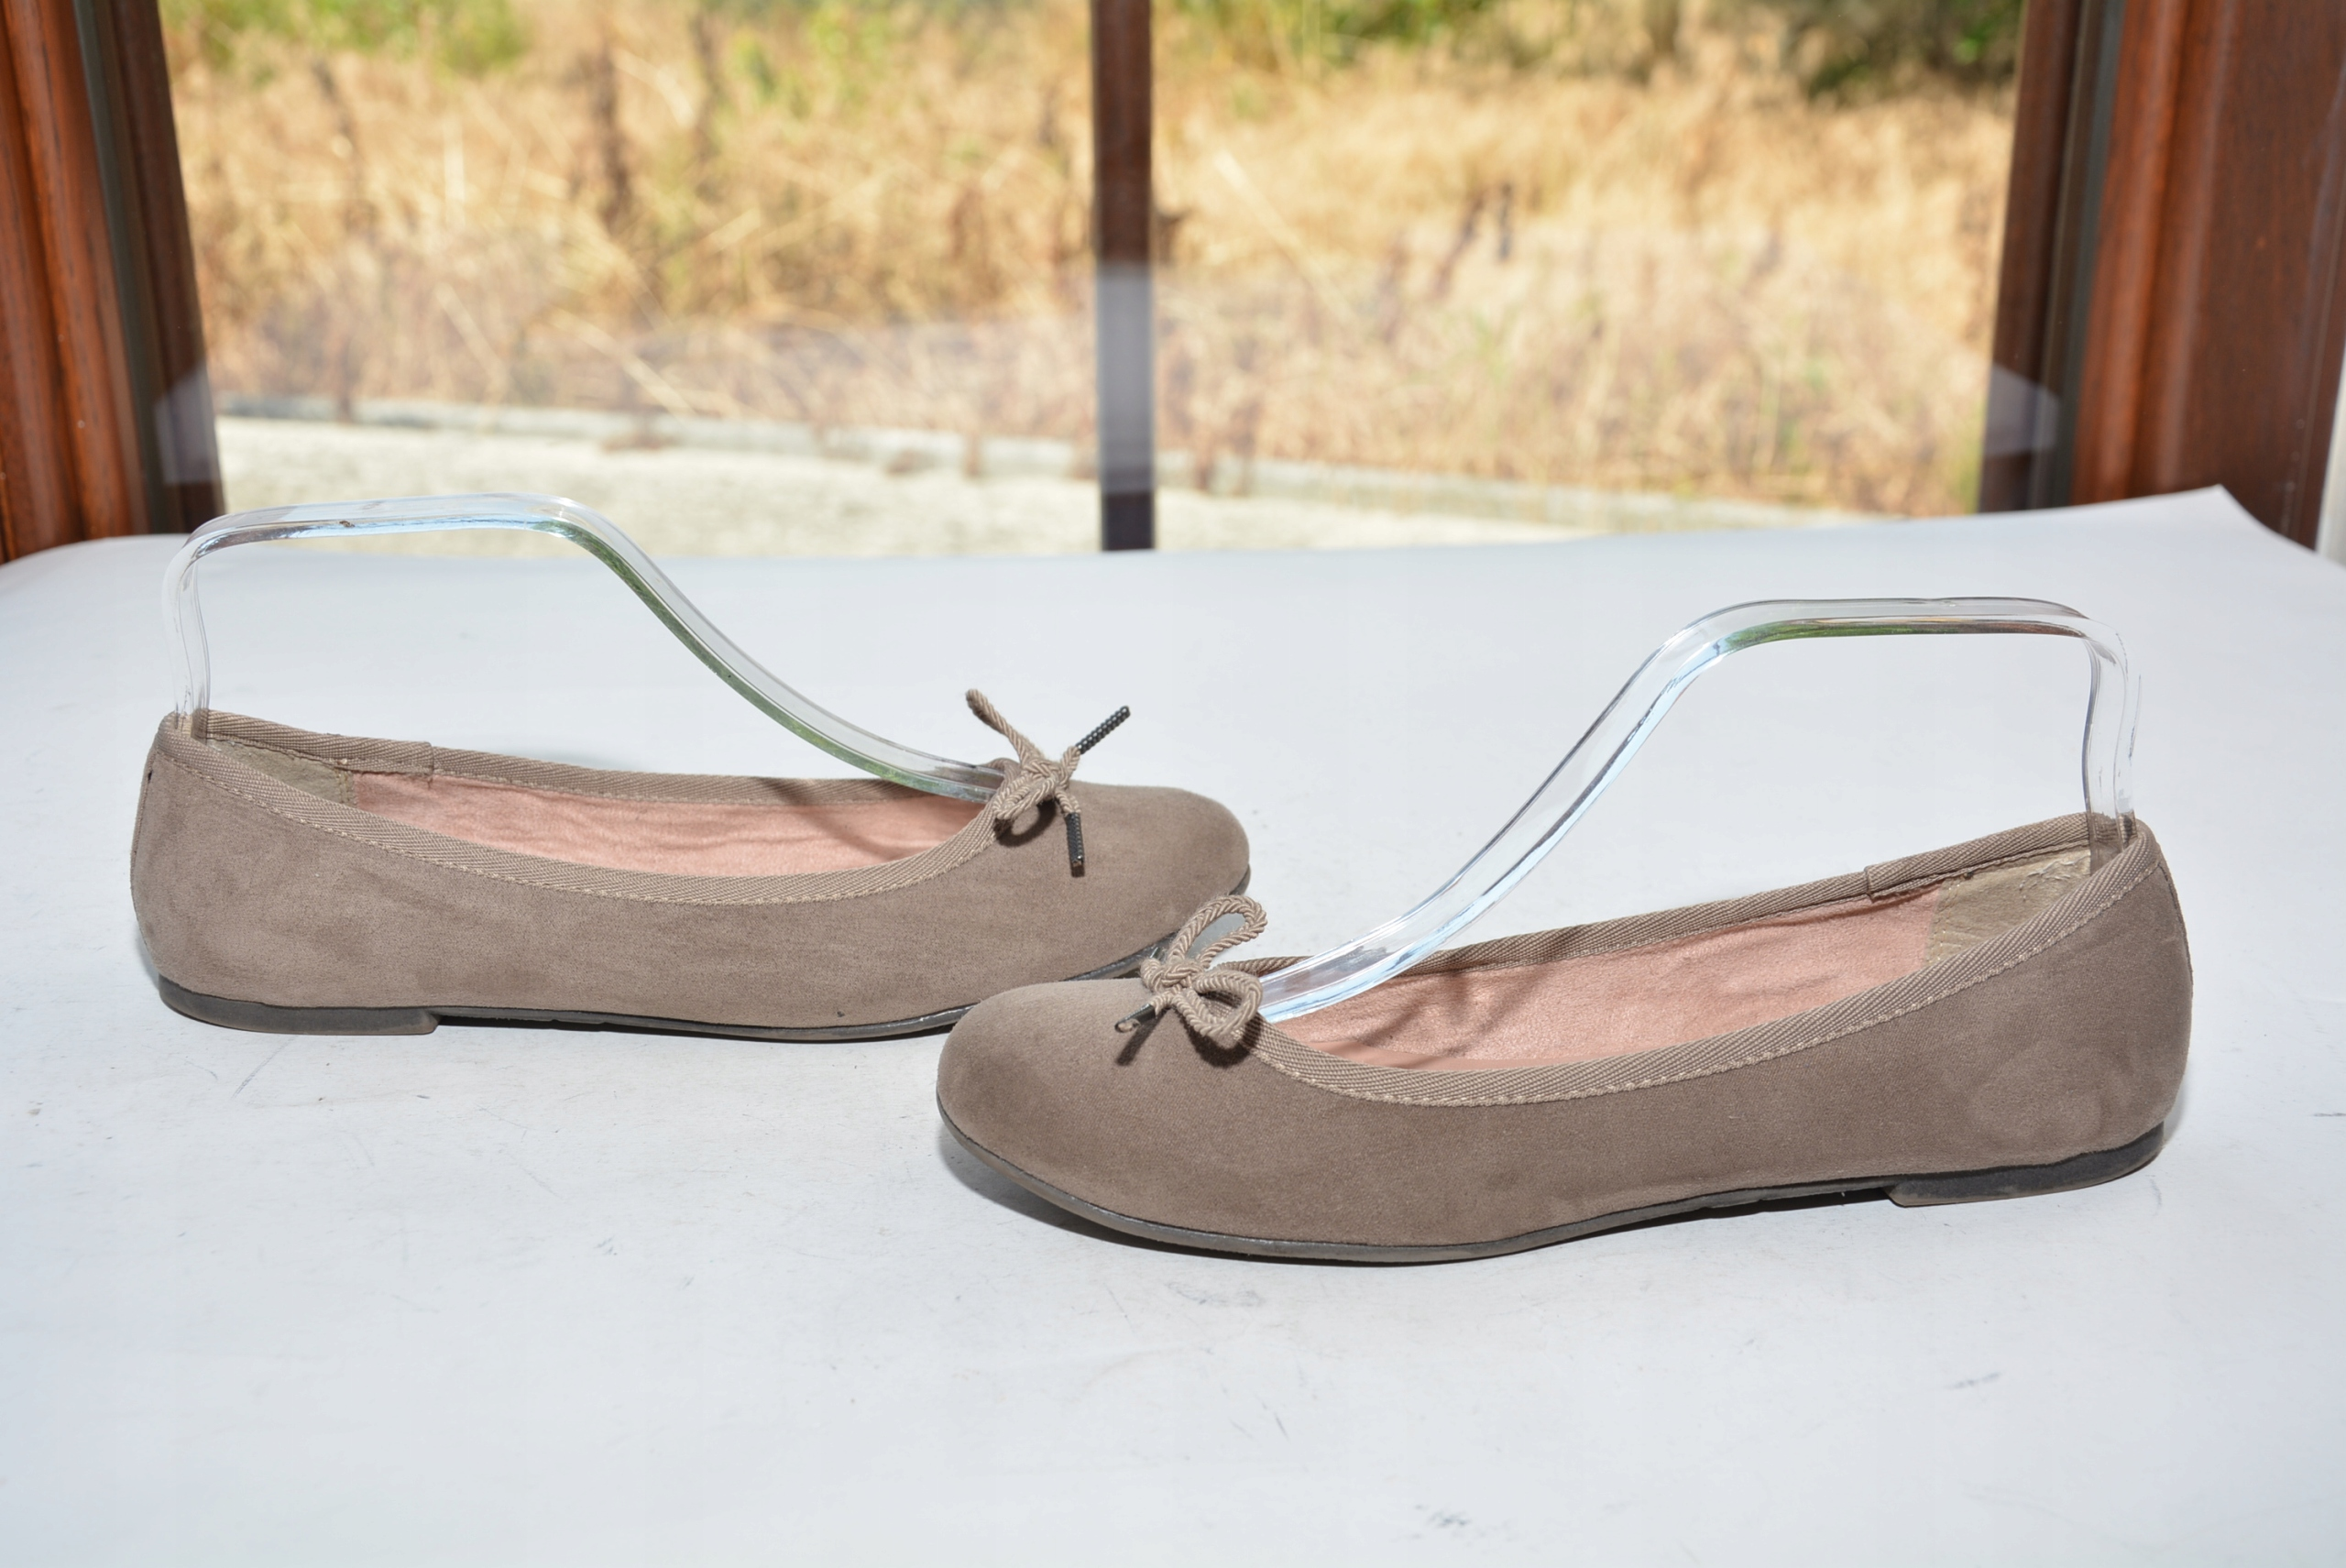 Extra baleriny TAMARIS komfort i wygoda :)38